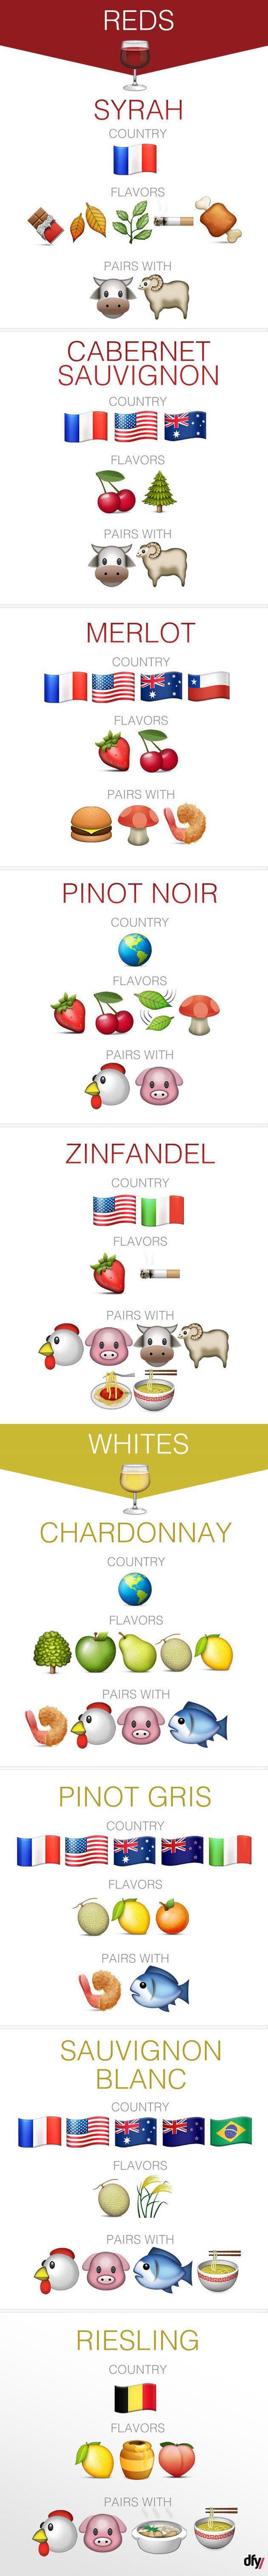 About wine: emojis | #culinária #cook #food #foodporn #bebidas #drink #alcohol #wine #vinho #infográfico #infographic